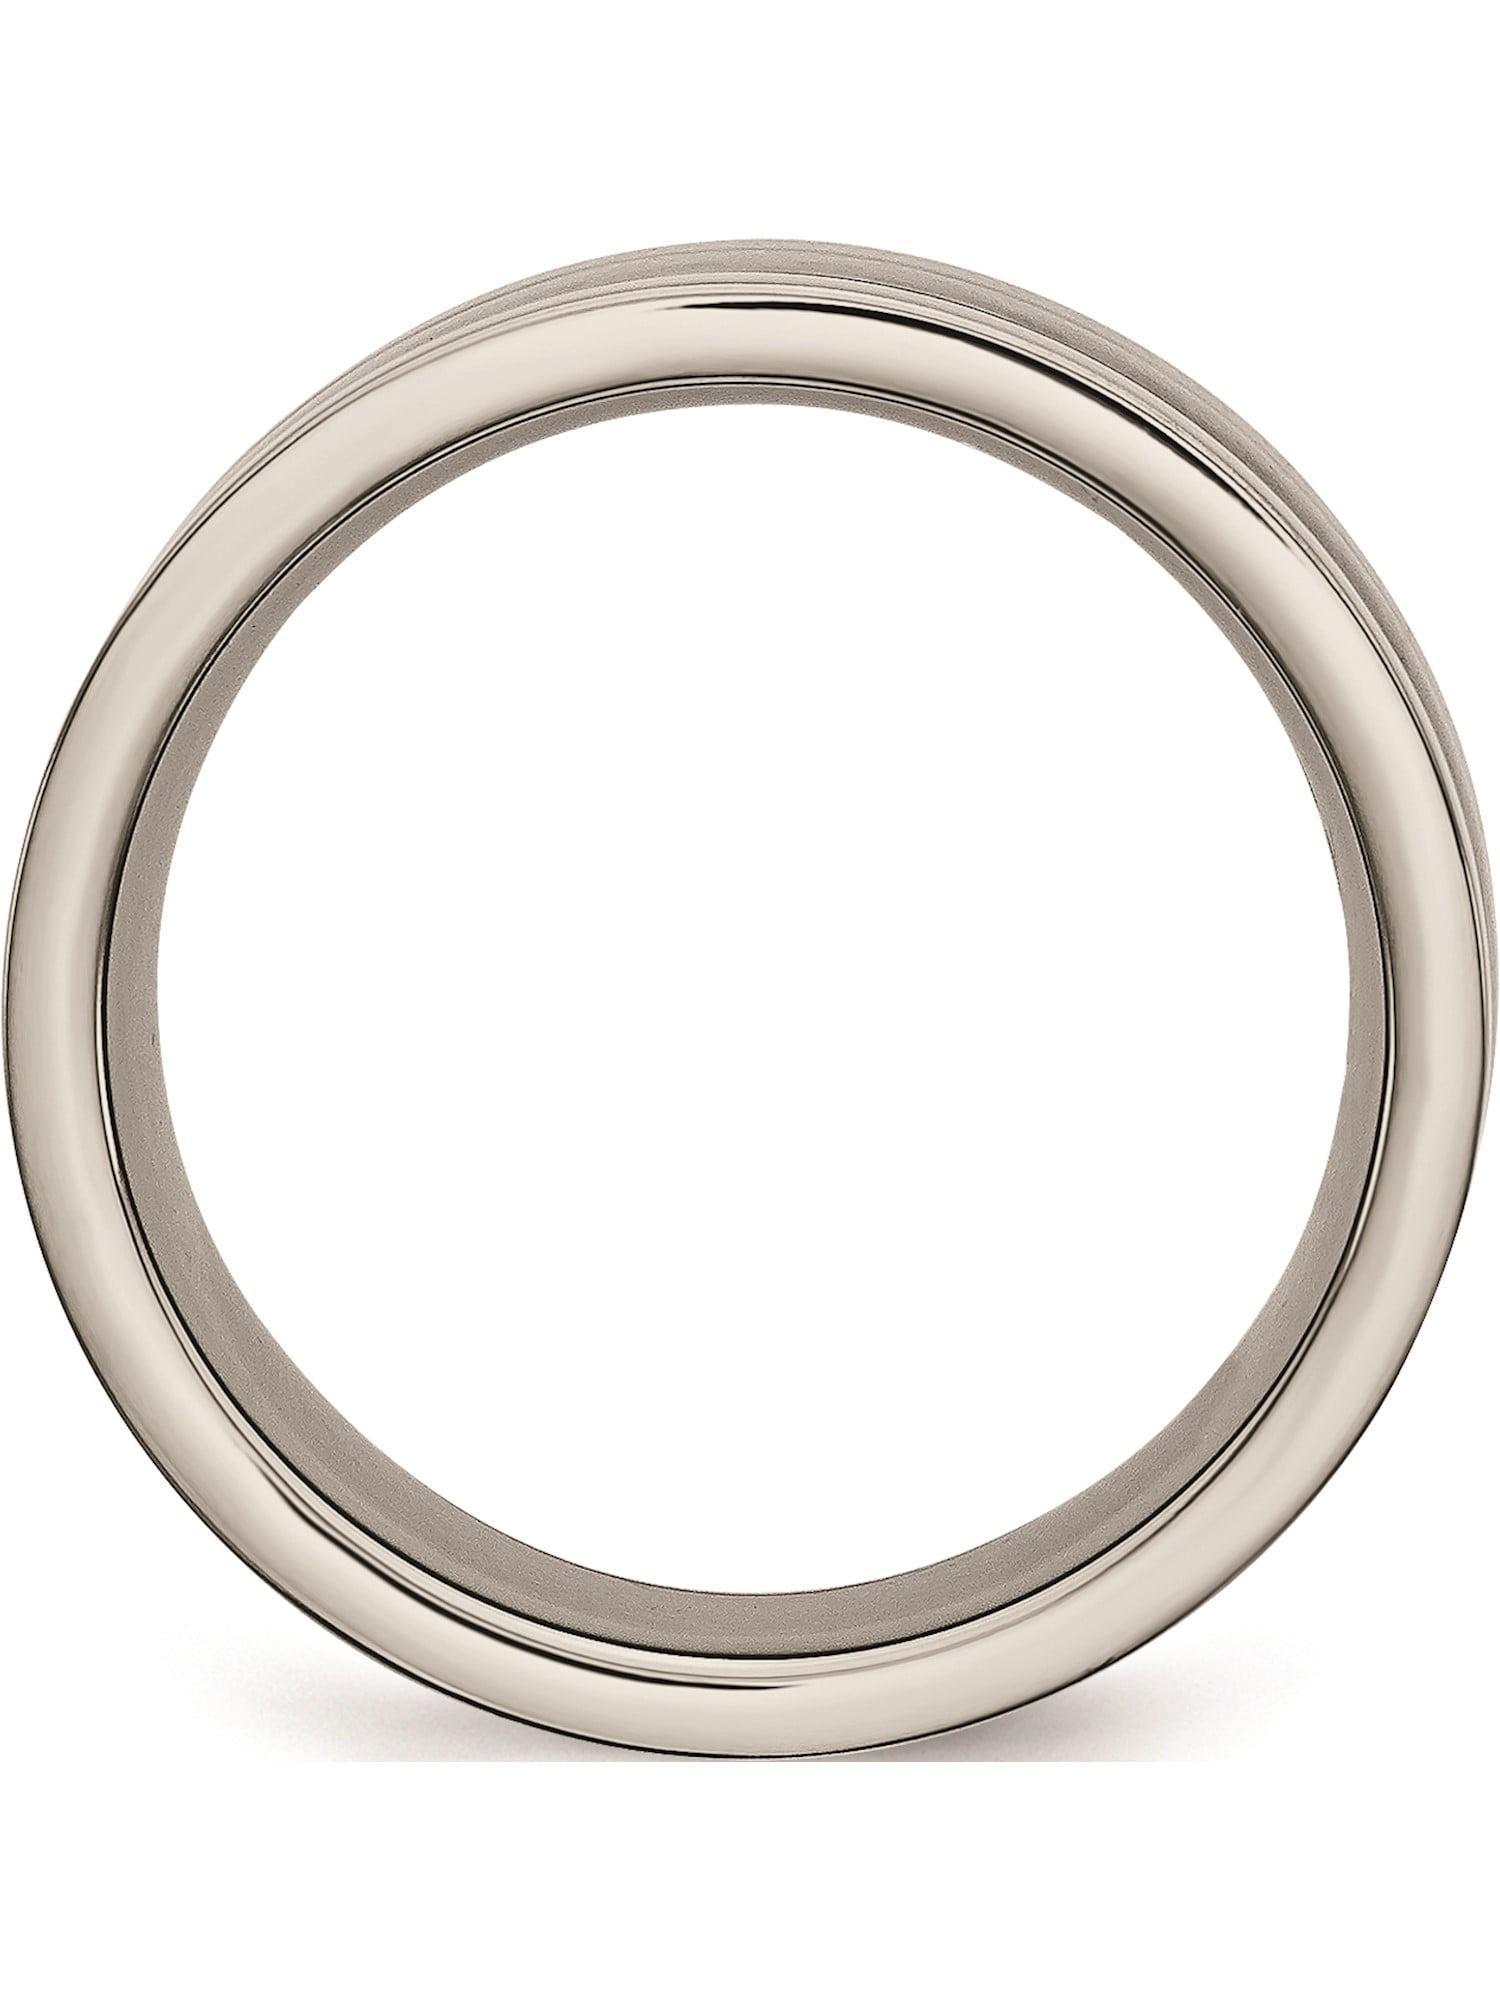 Best Quality Free Gift Box Titanium /& Grey Carbon Fiber 8mm Polished Band